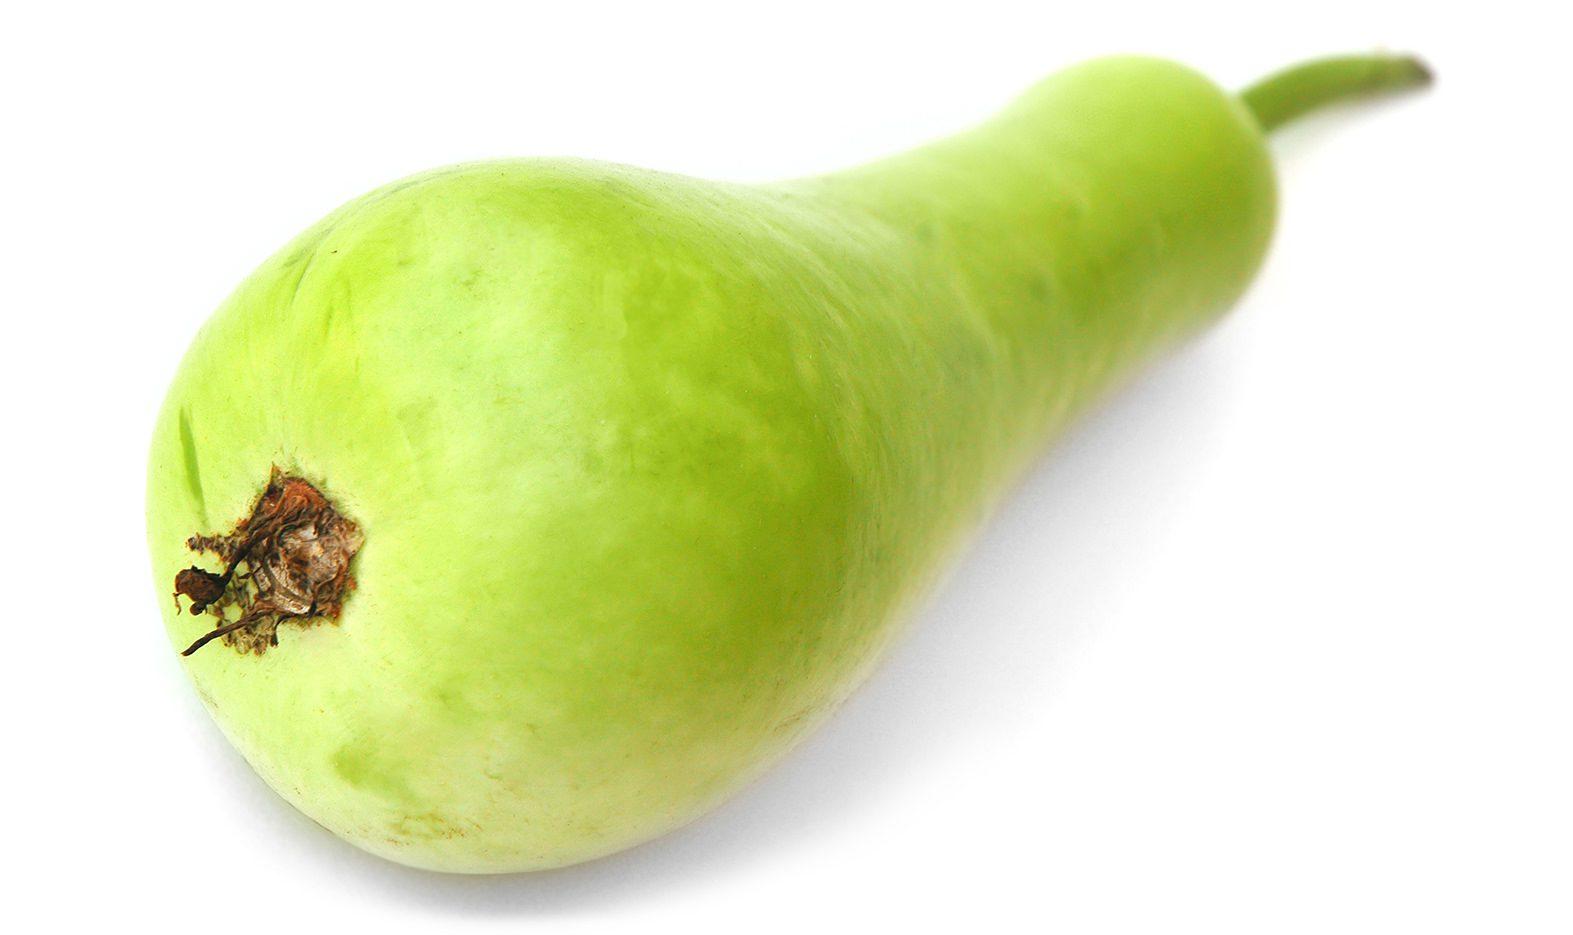 Opo Squash Image